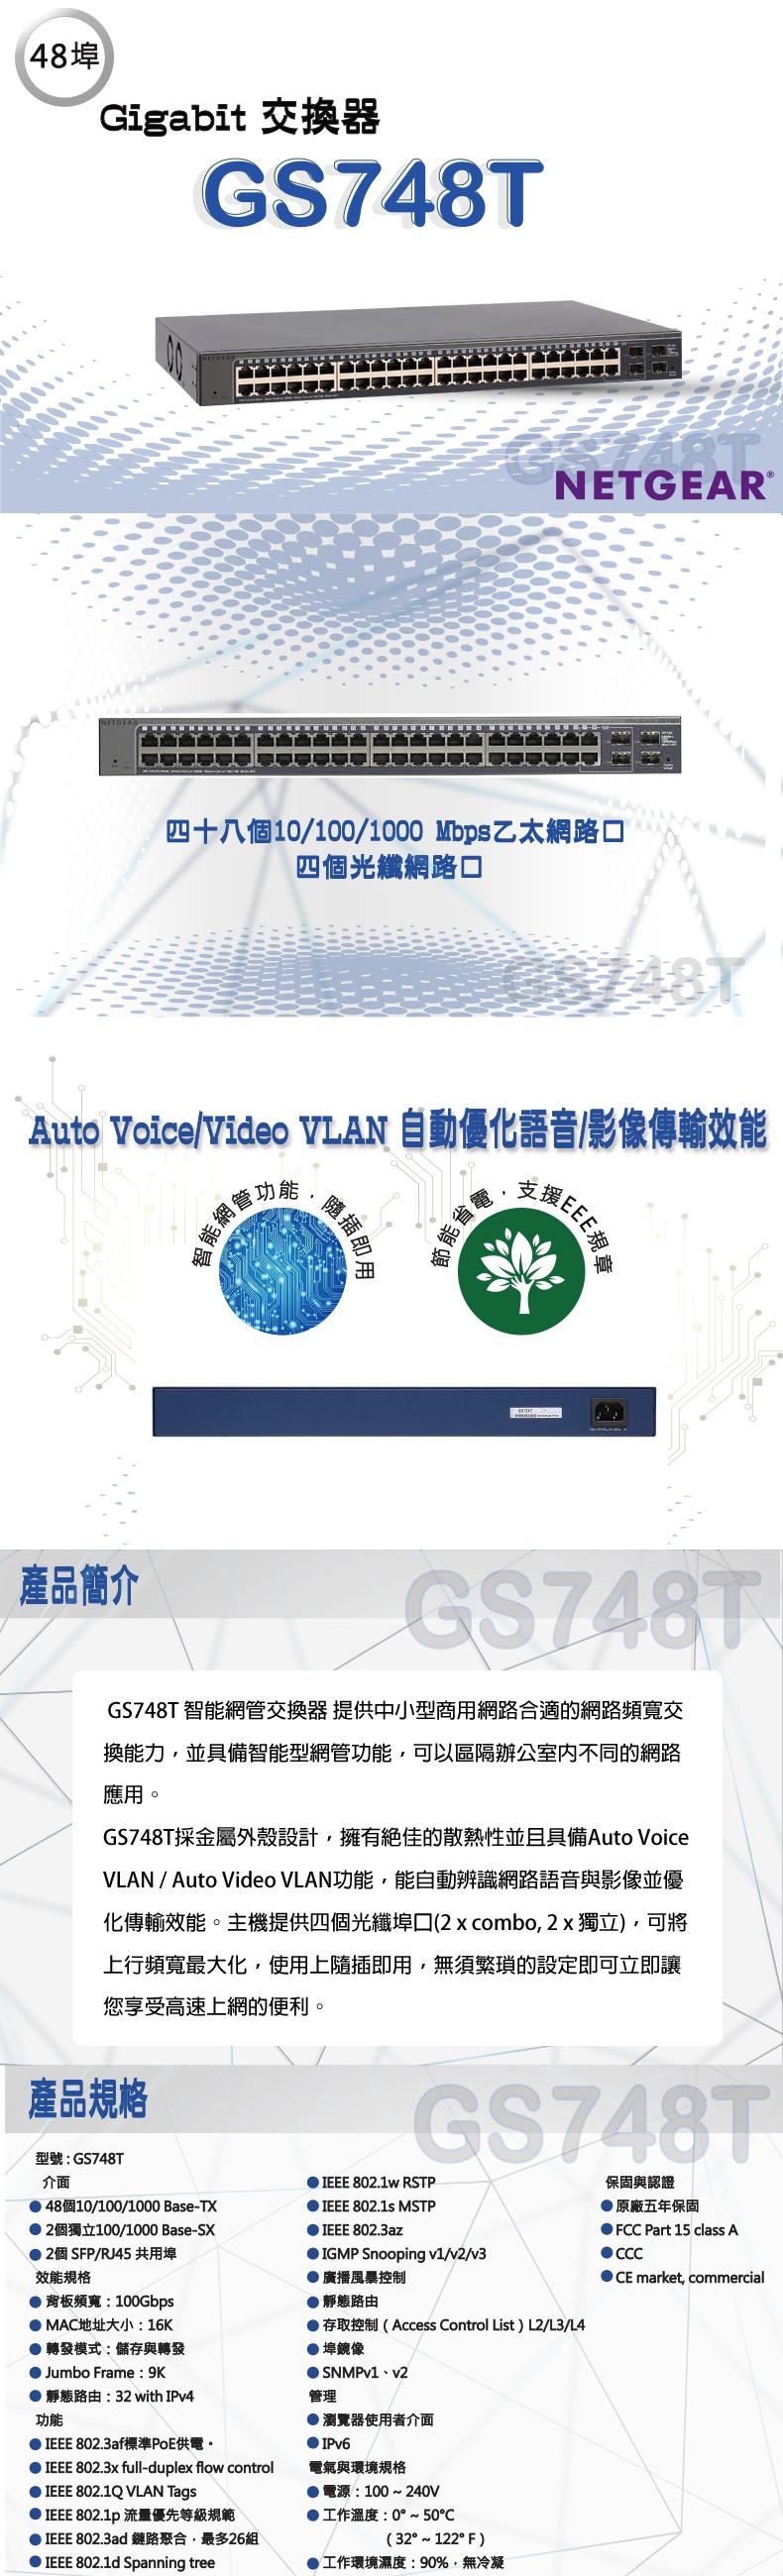 GS748T文案